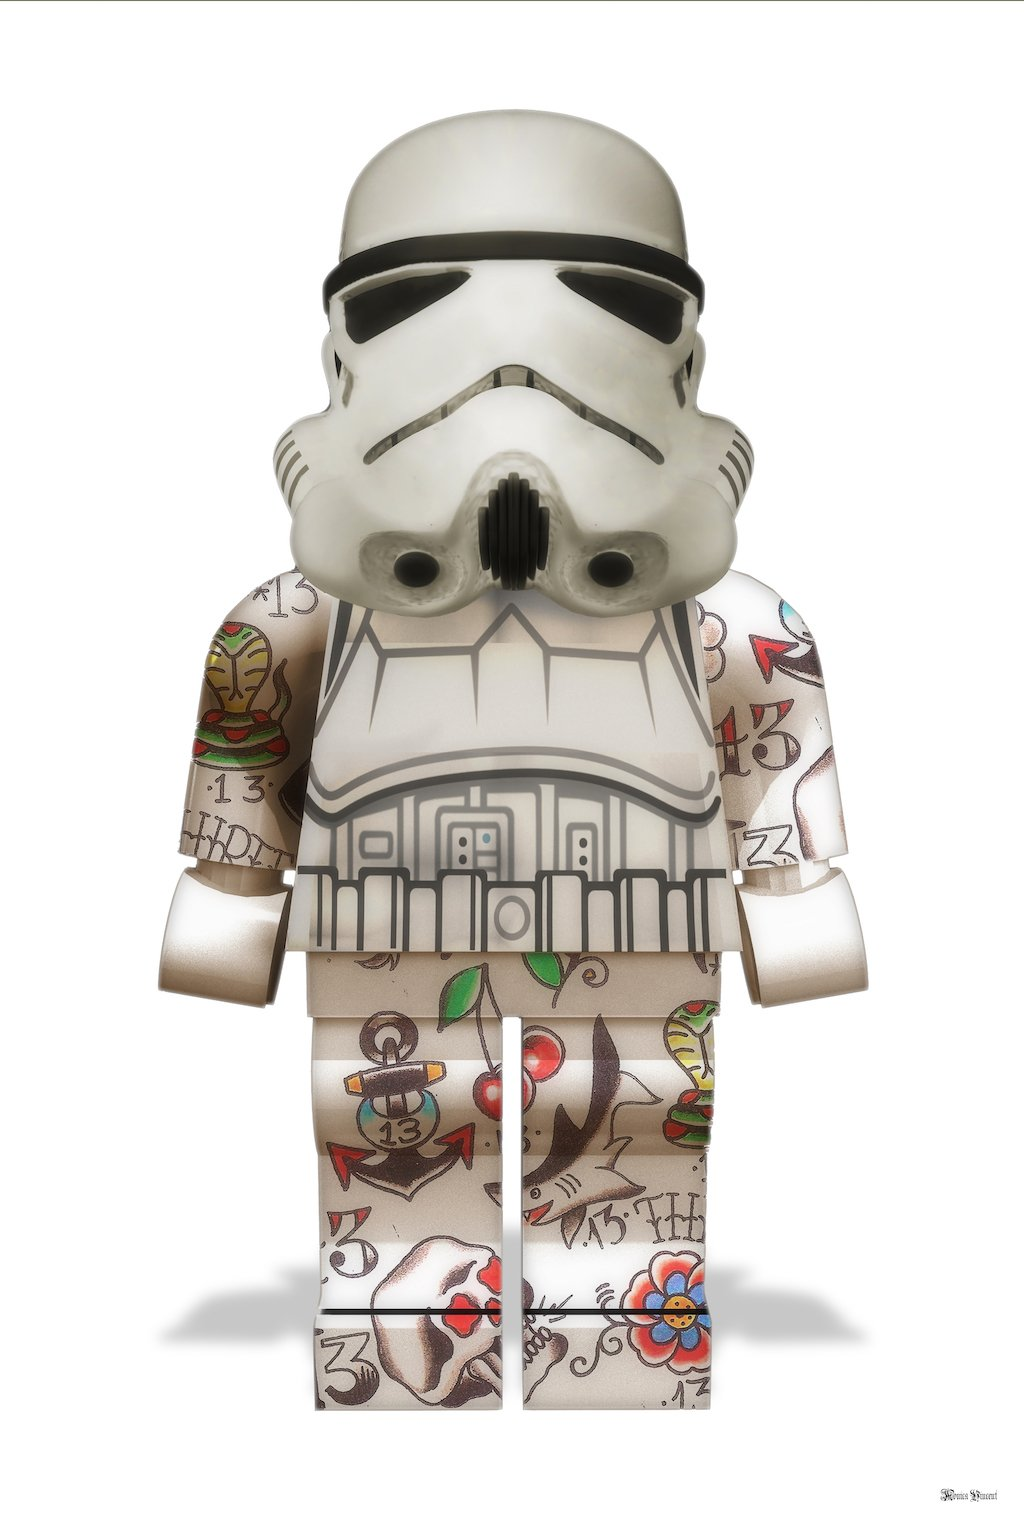 Lego Storm Trooper (White Background) - Large - Framed by Monica Vincent